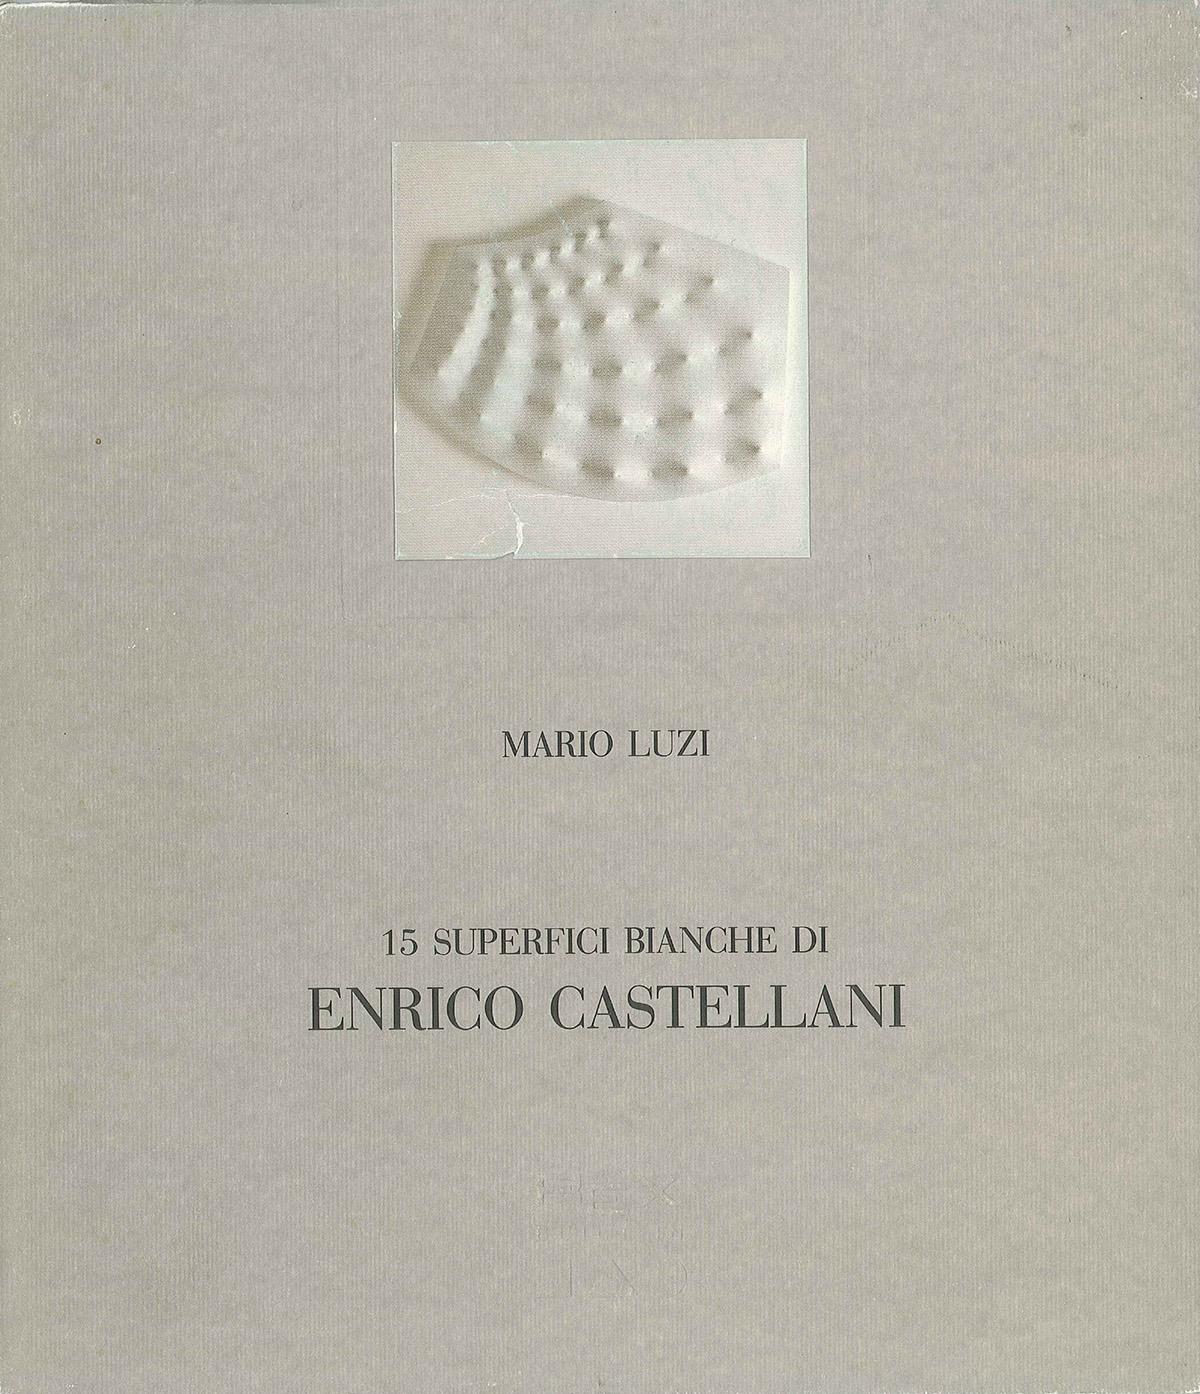 Copertina - 15 superfici bianche di Enrico Castellani, Mario Luzi, 1994, Rex Built-In / Zanussi Italia, Udine